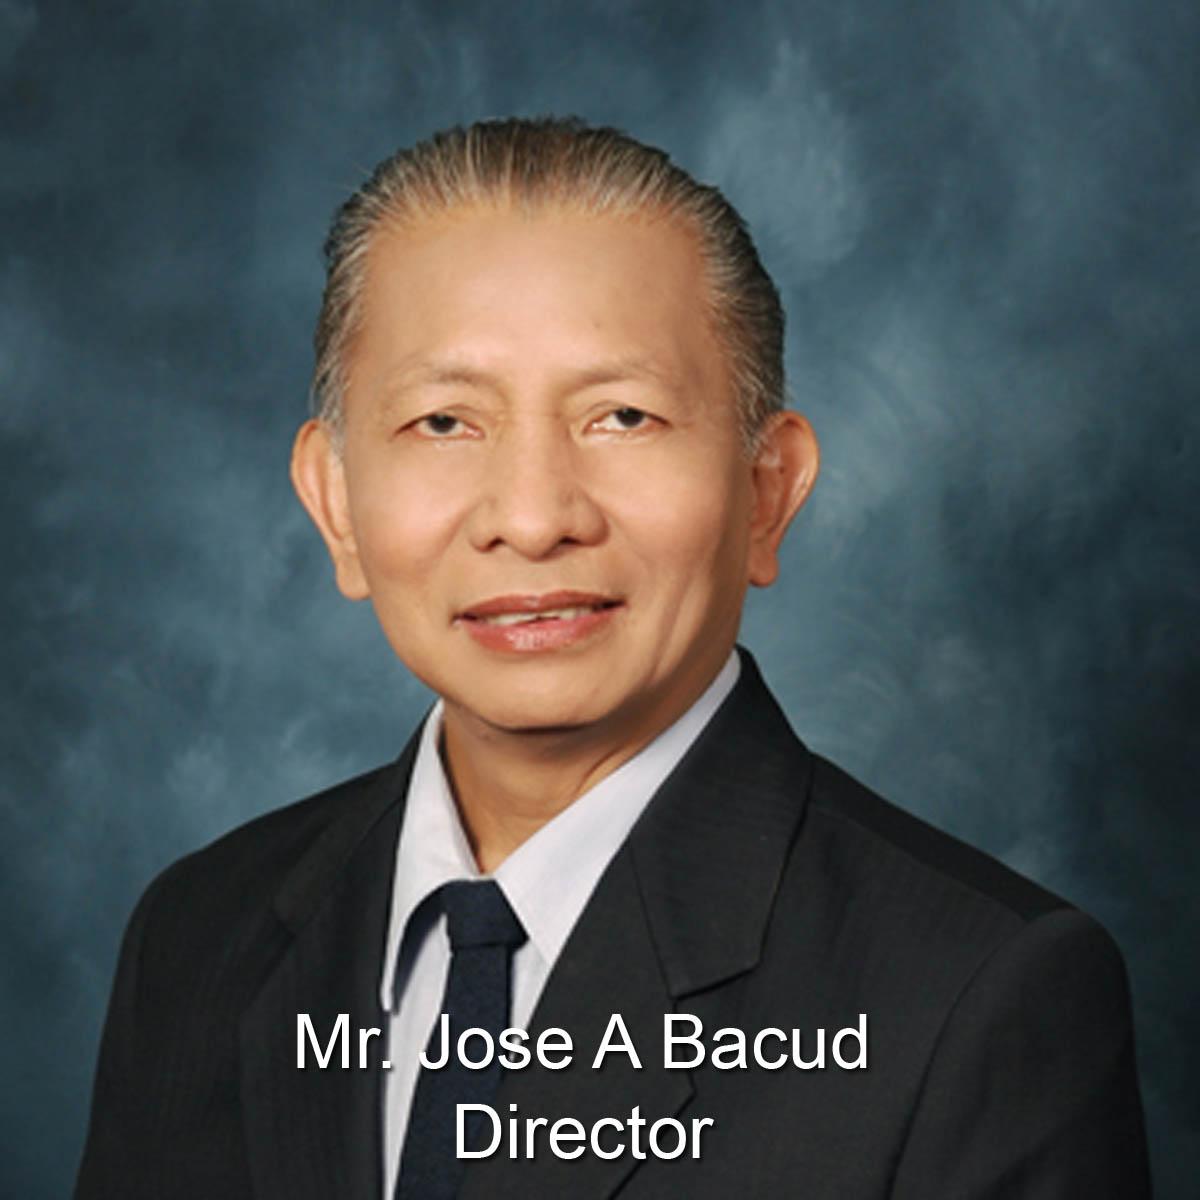 006MrJoseBacud_Director